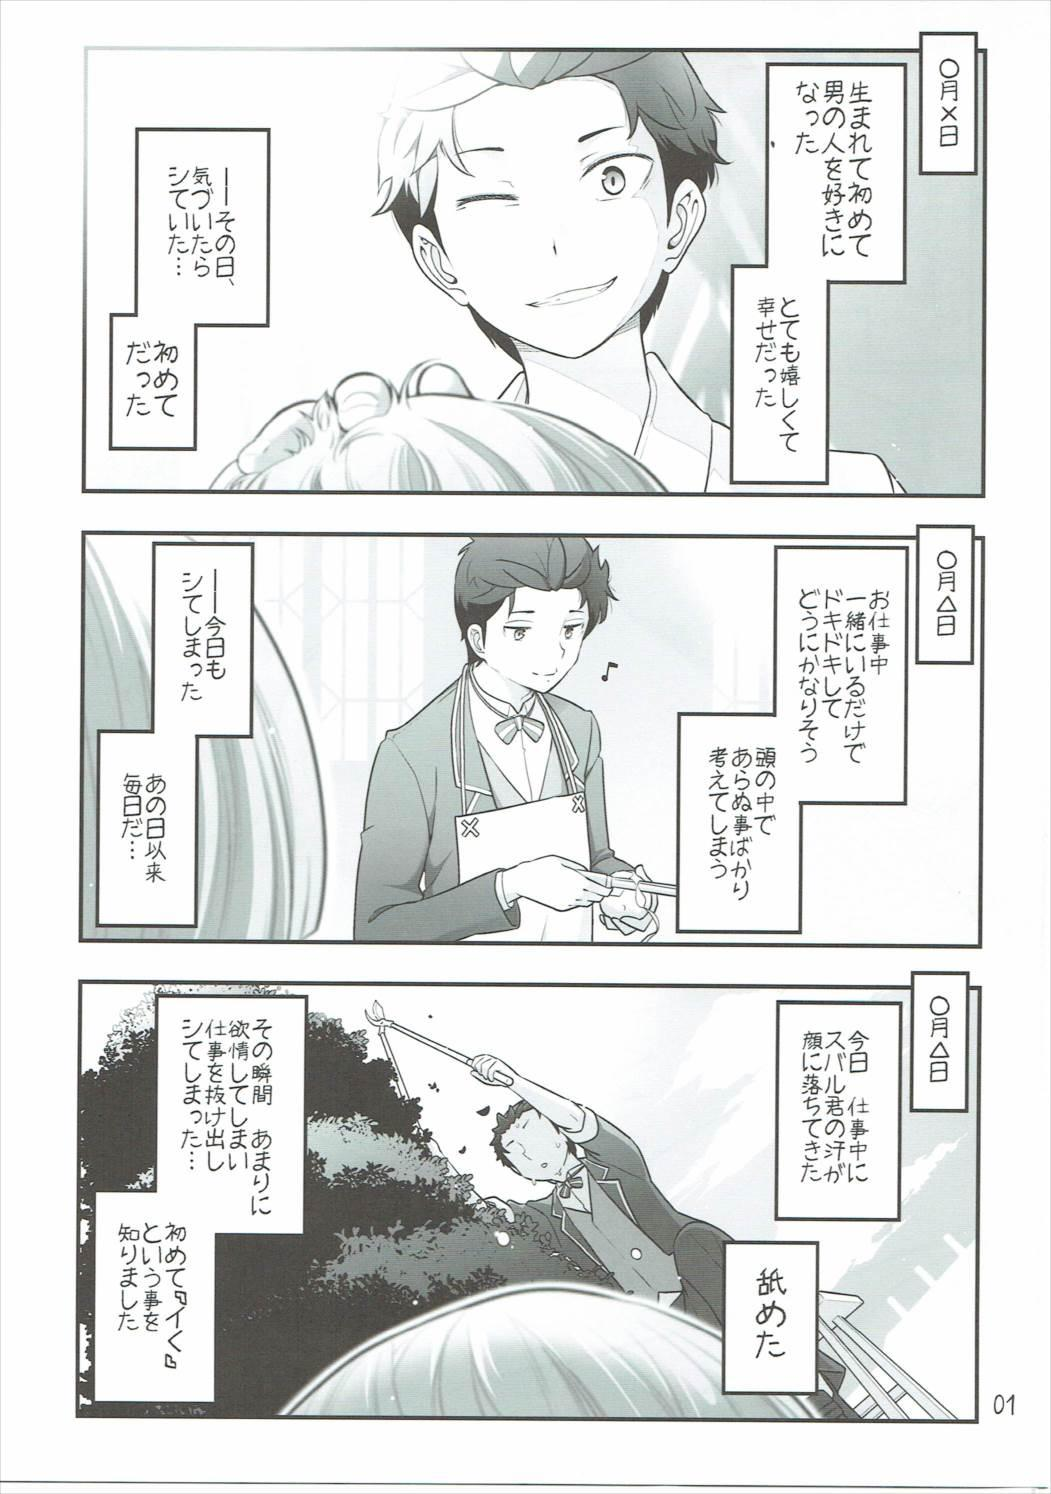 RMH Rem-san maji ecchi 1